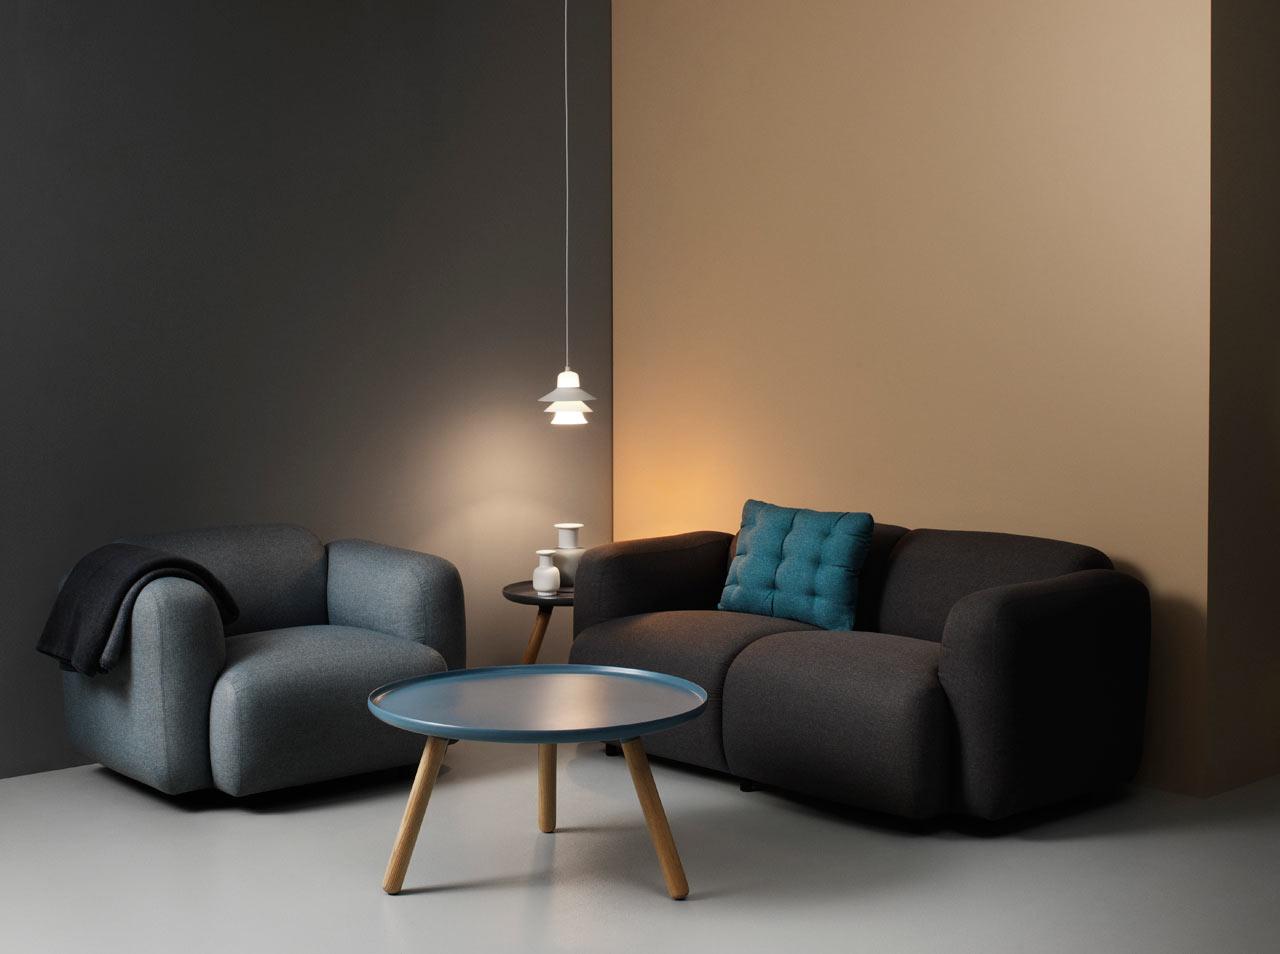 Normann Copenhagen's Swell Seating by Jonas Wagell